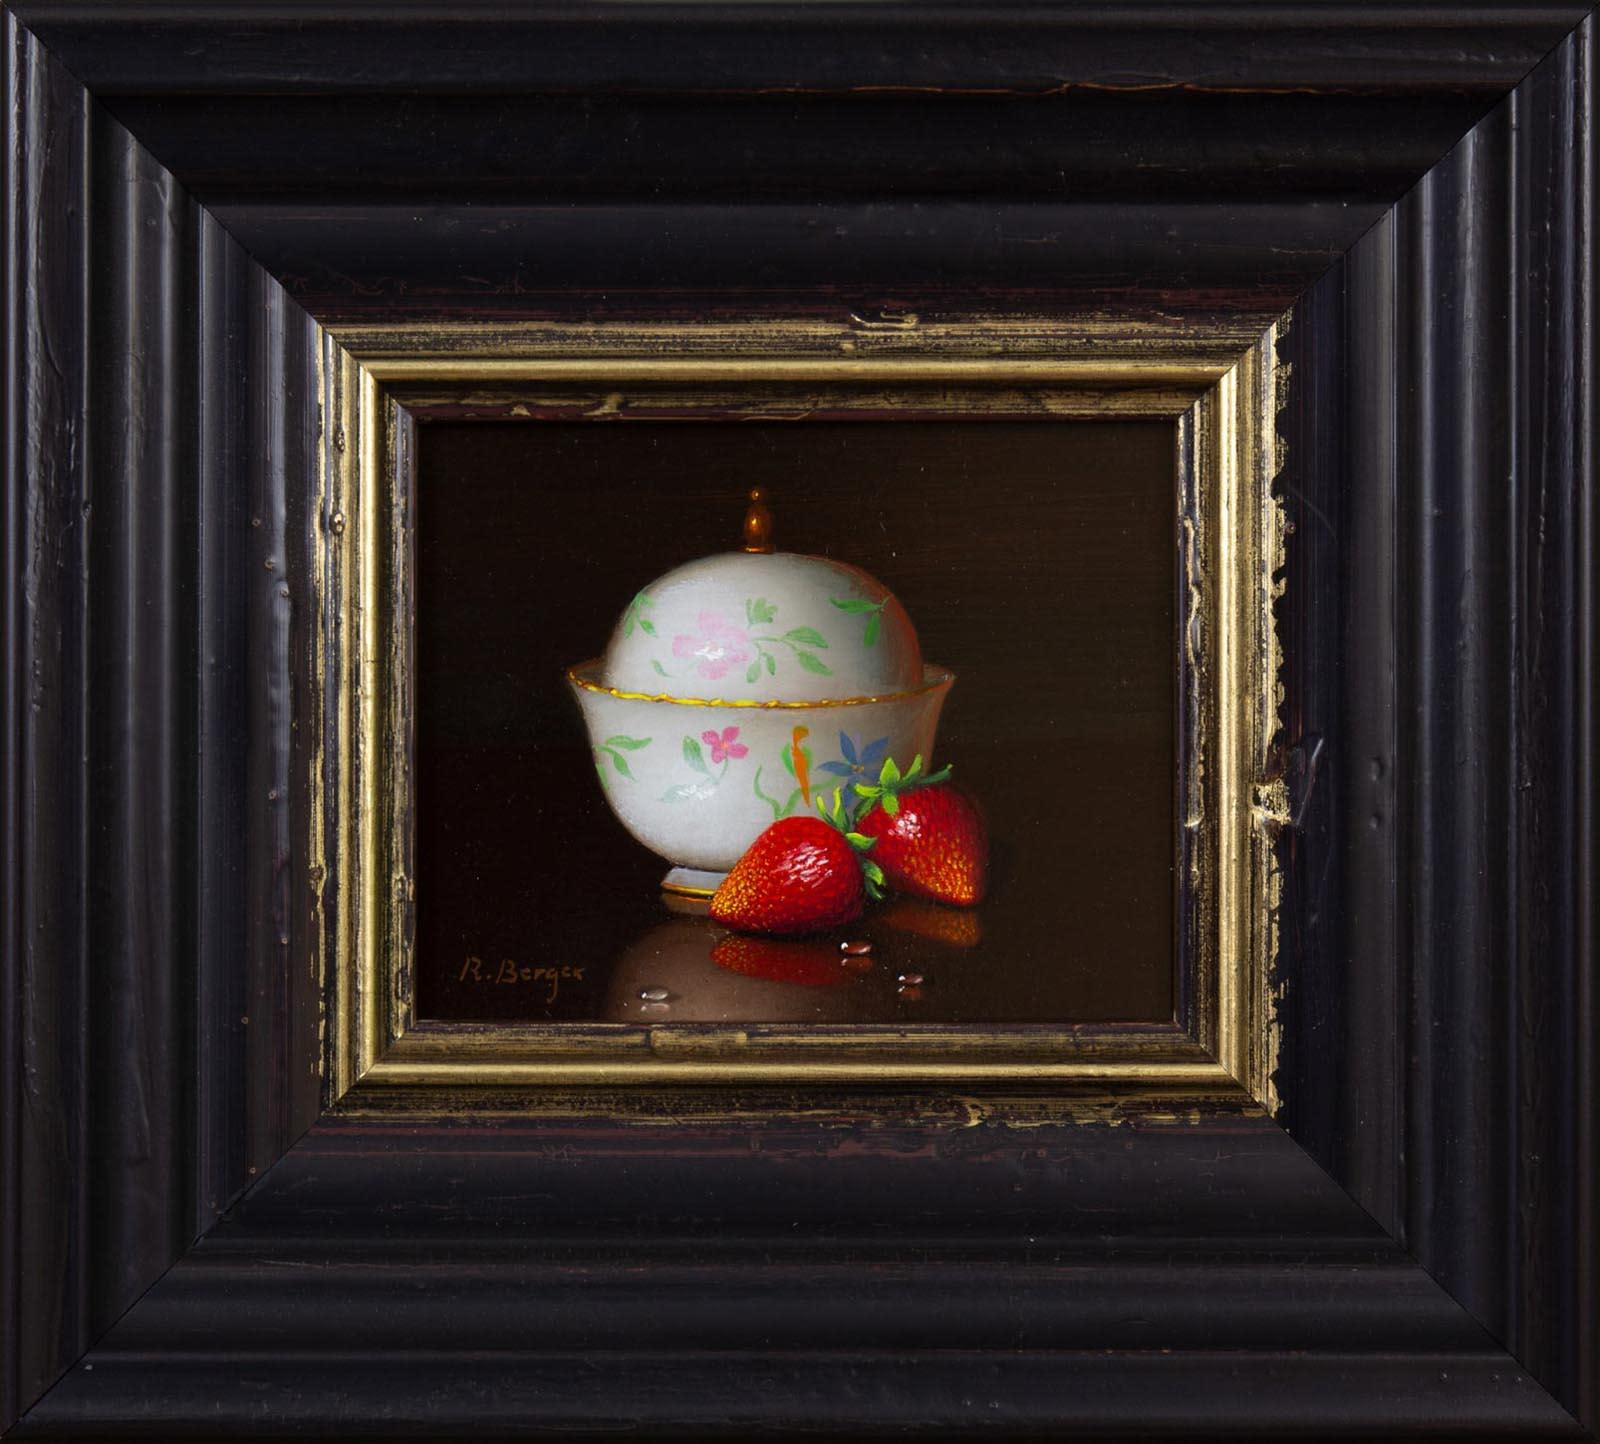 Strawberries, Ronald Berger